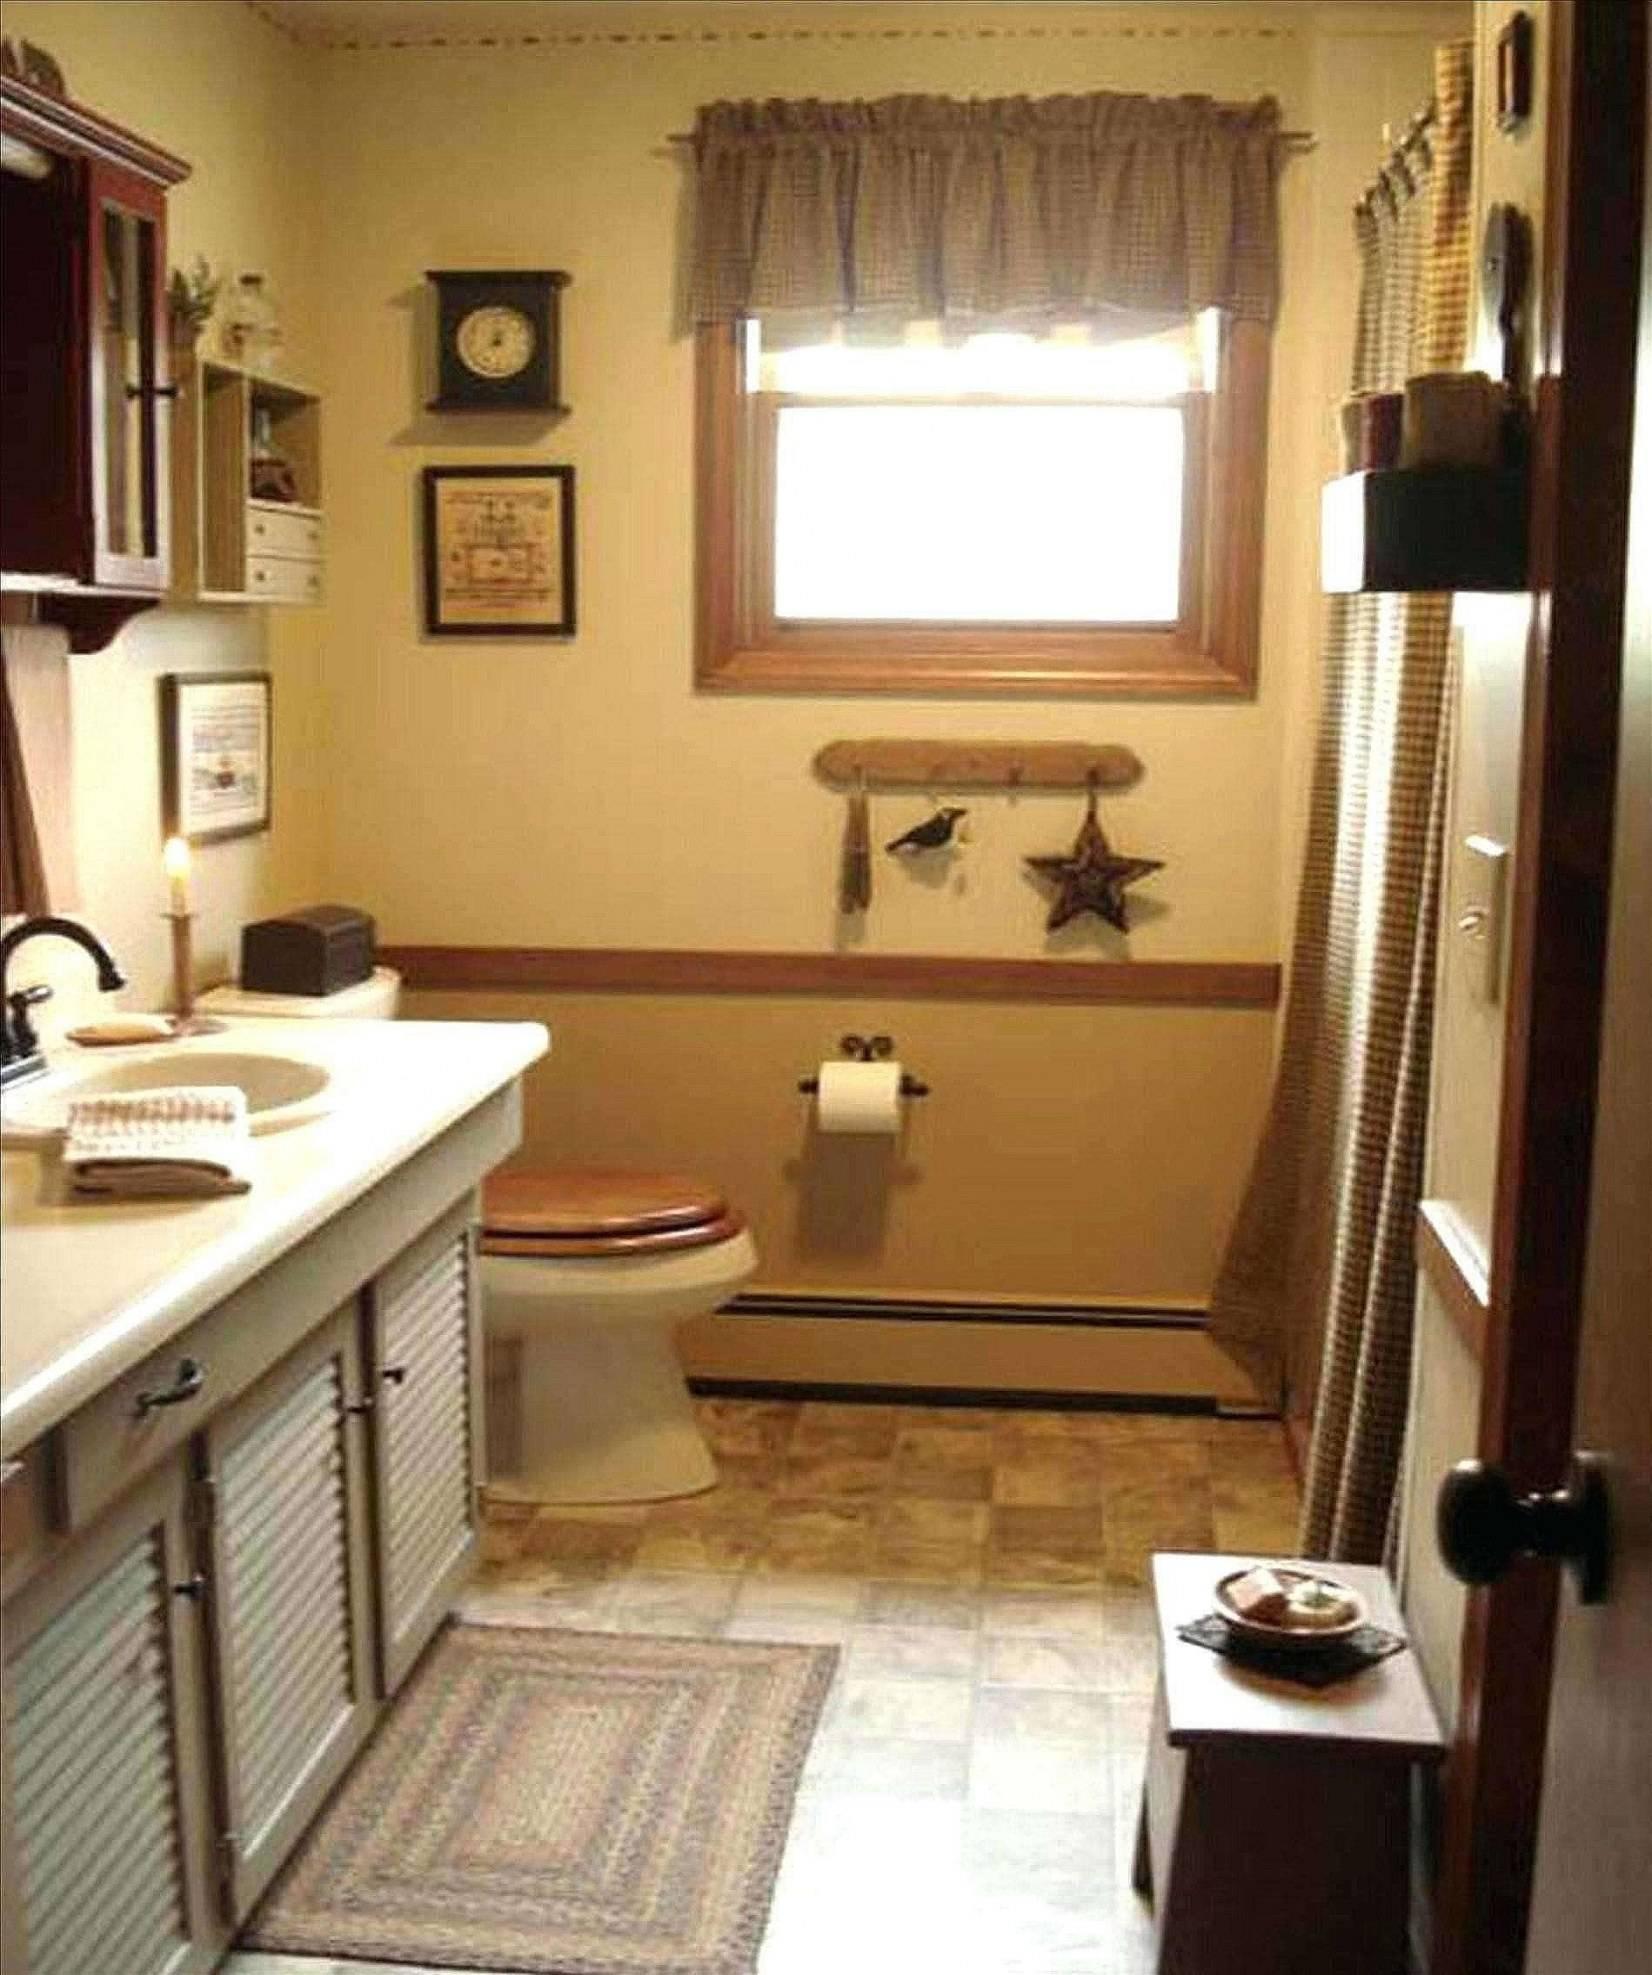 small bathroom ideas new small bathroom design ideas 50ger of small bathroom ideas